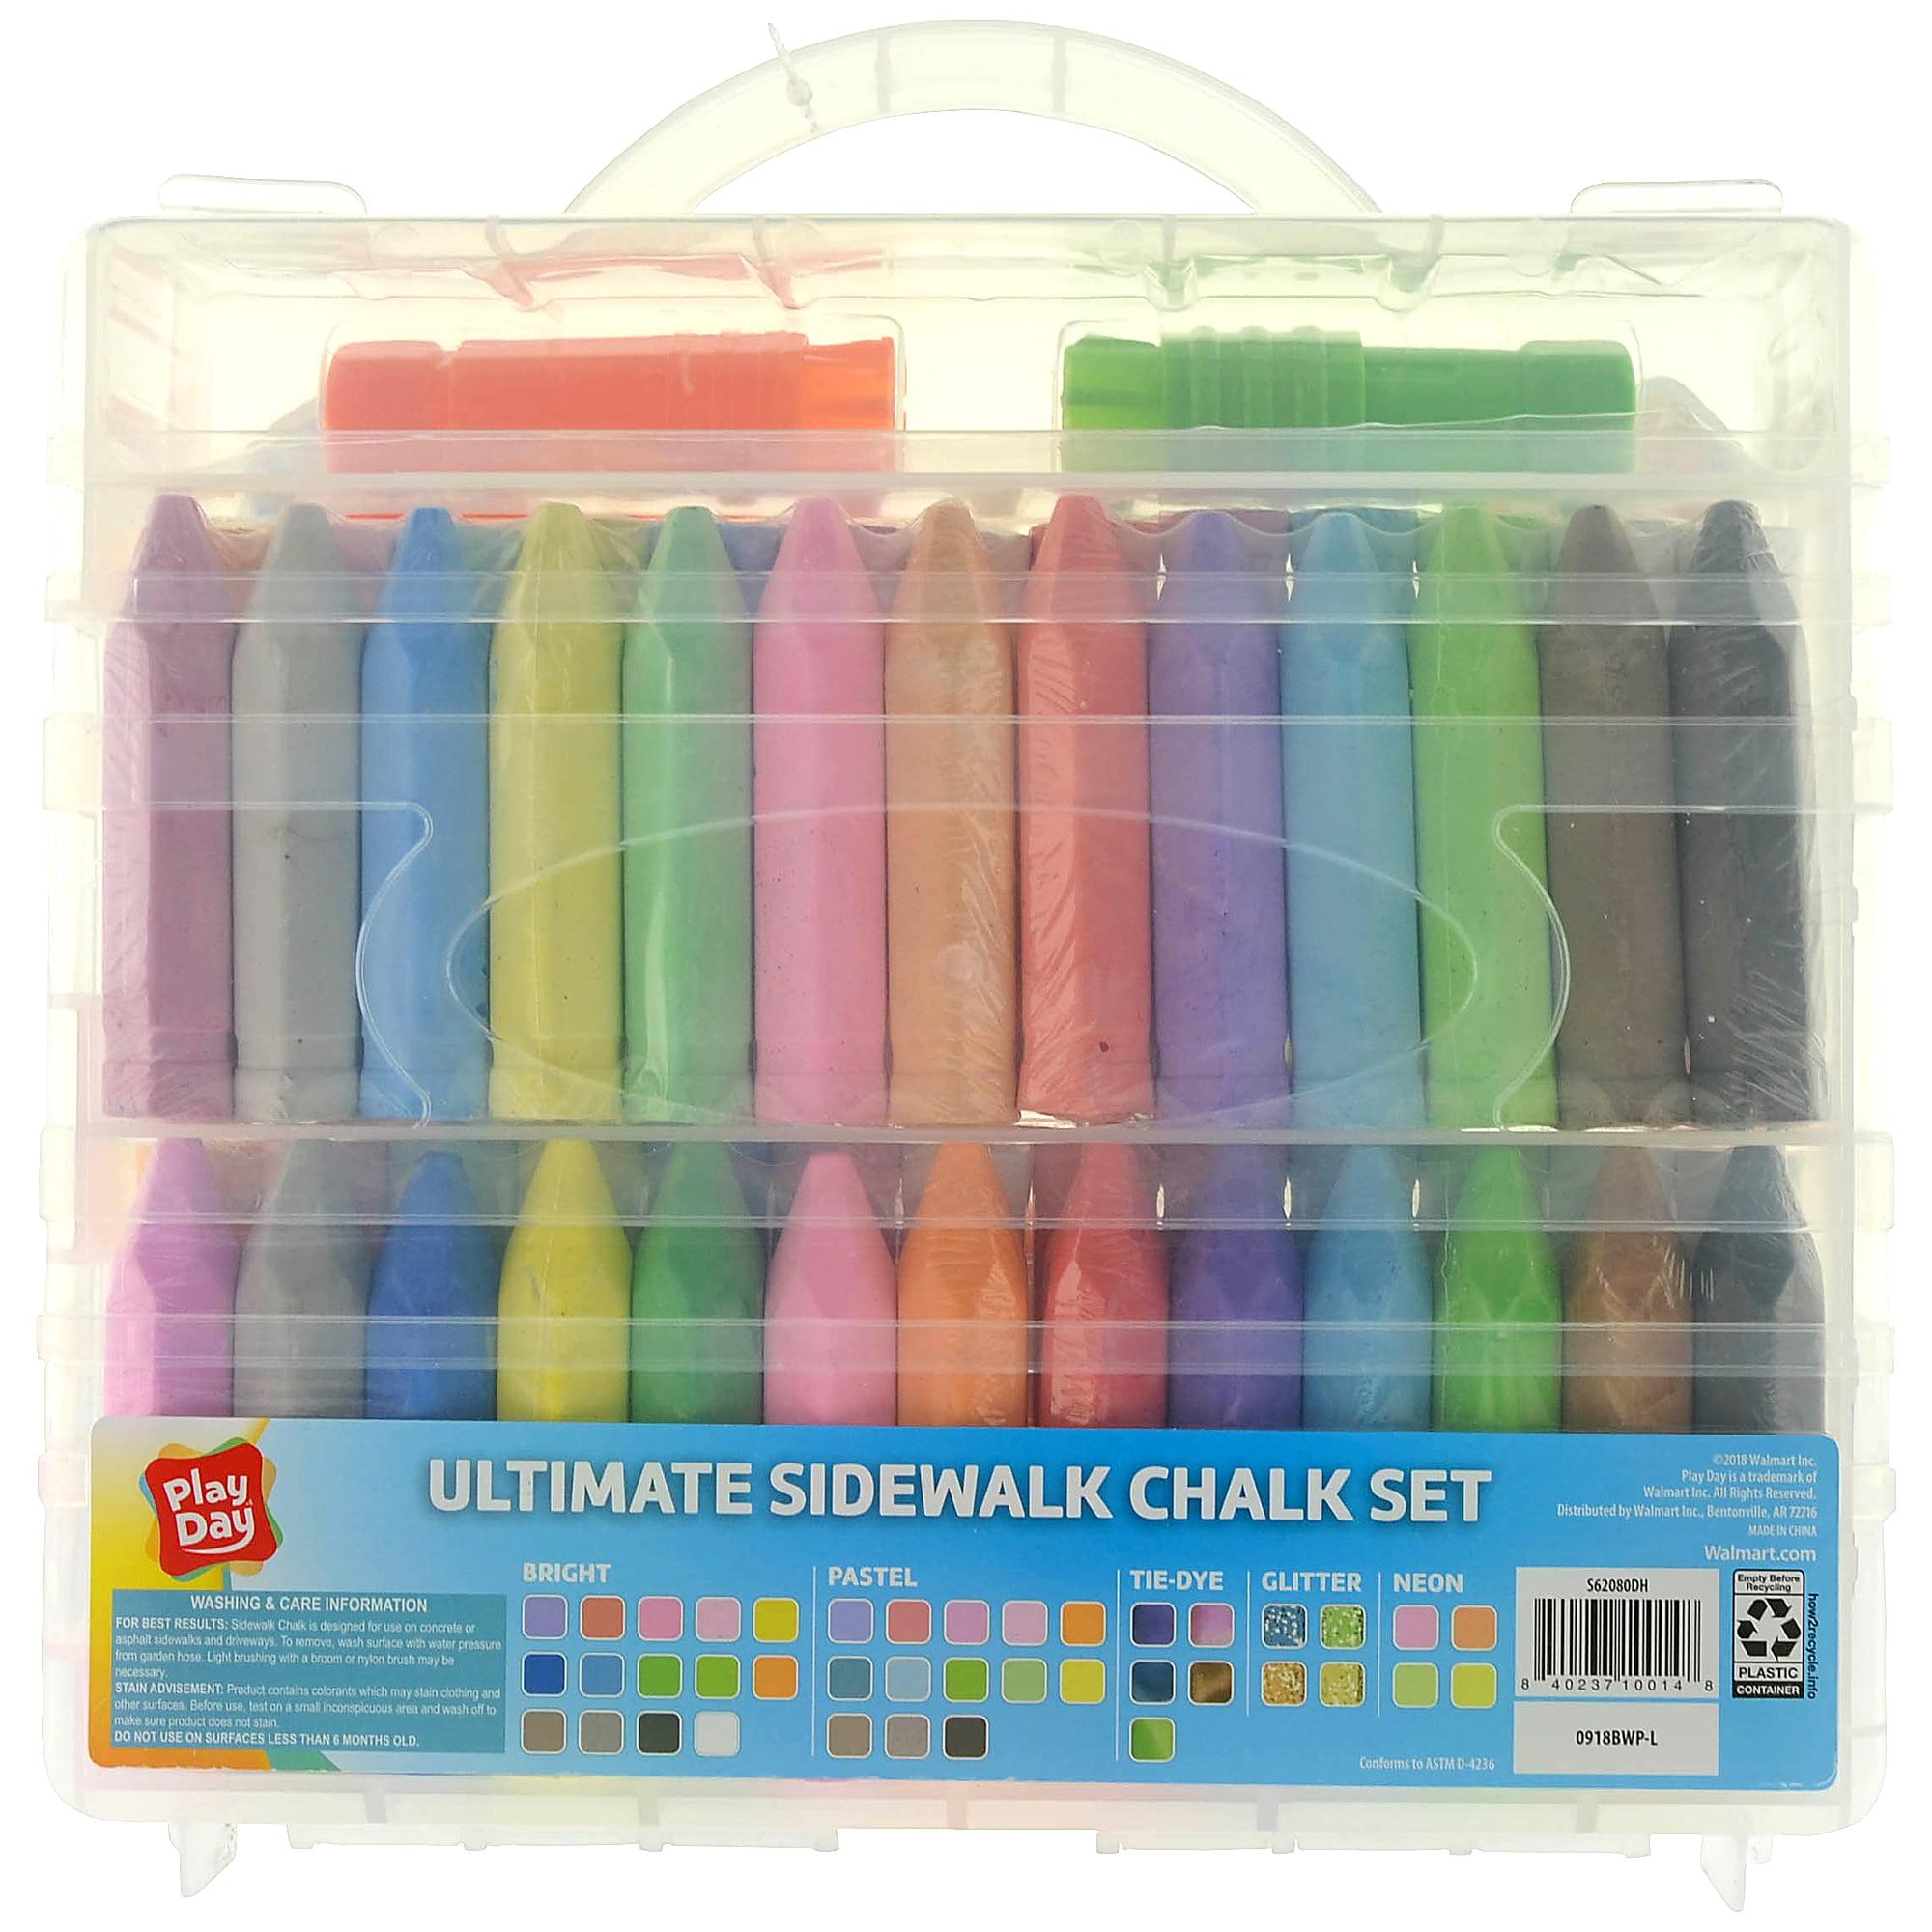 Play Day Ultimate Sidewalk Chalk Set, 80 Pieces